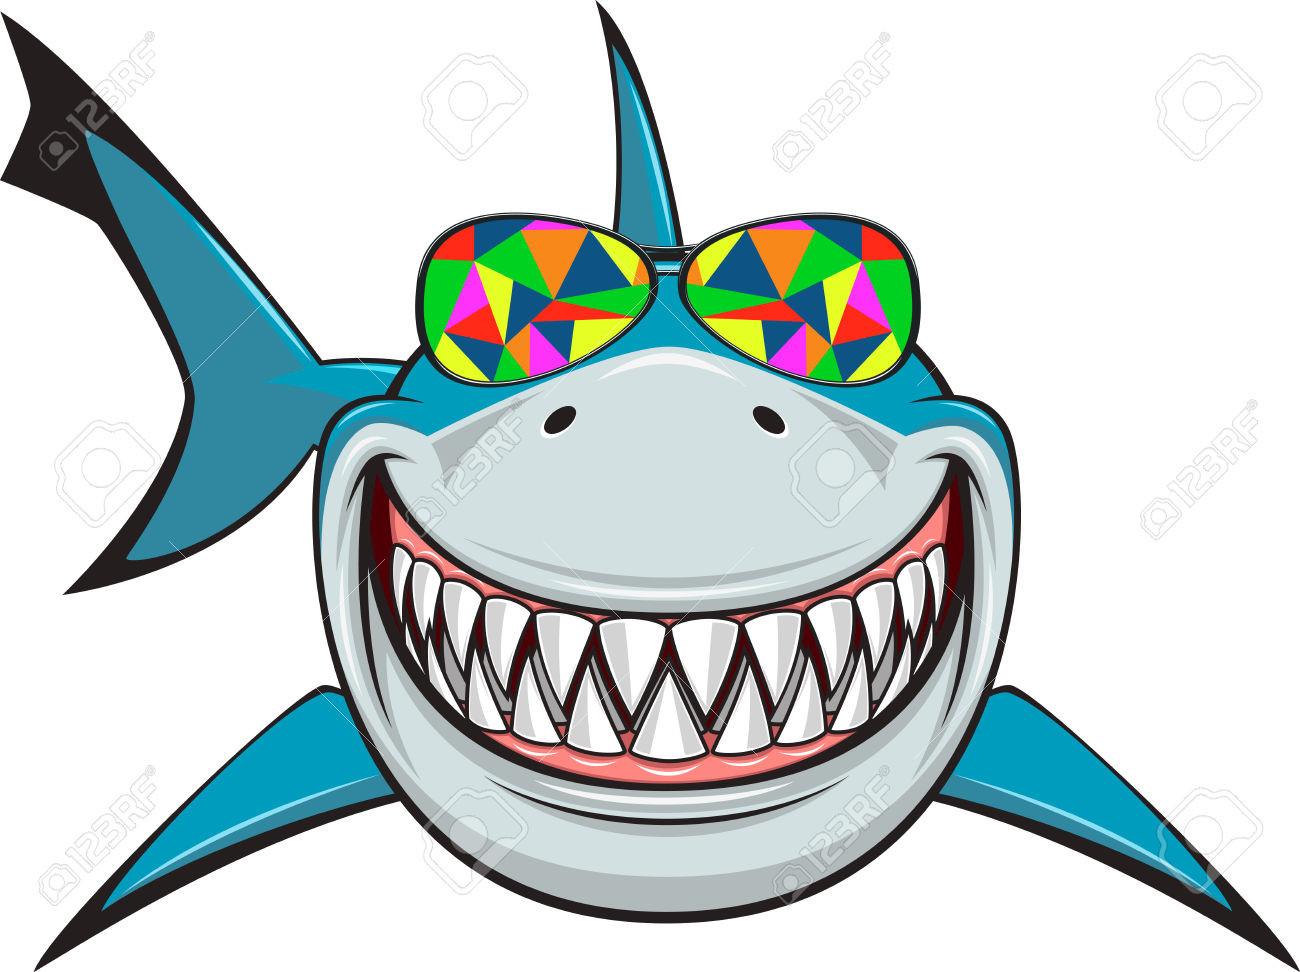 Cute Shark Clipart at GetDrawings | Free download